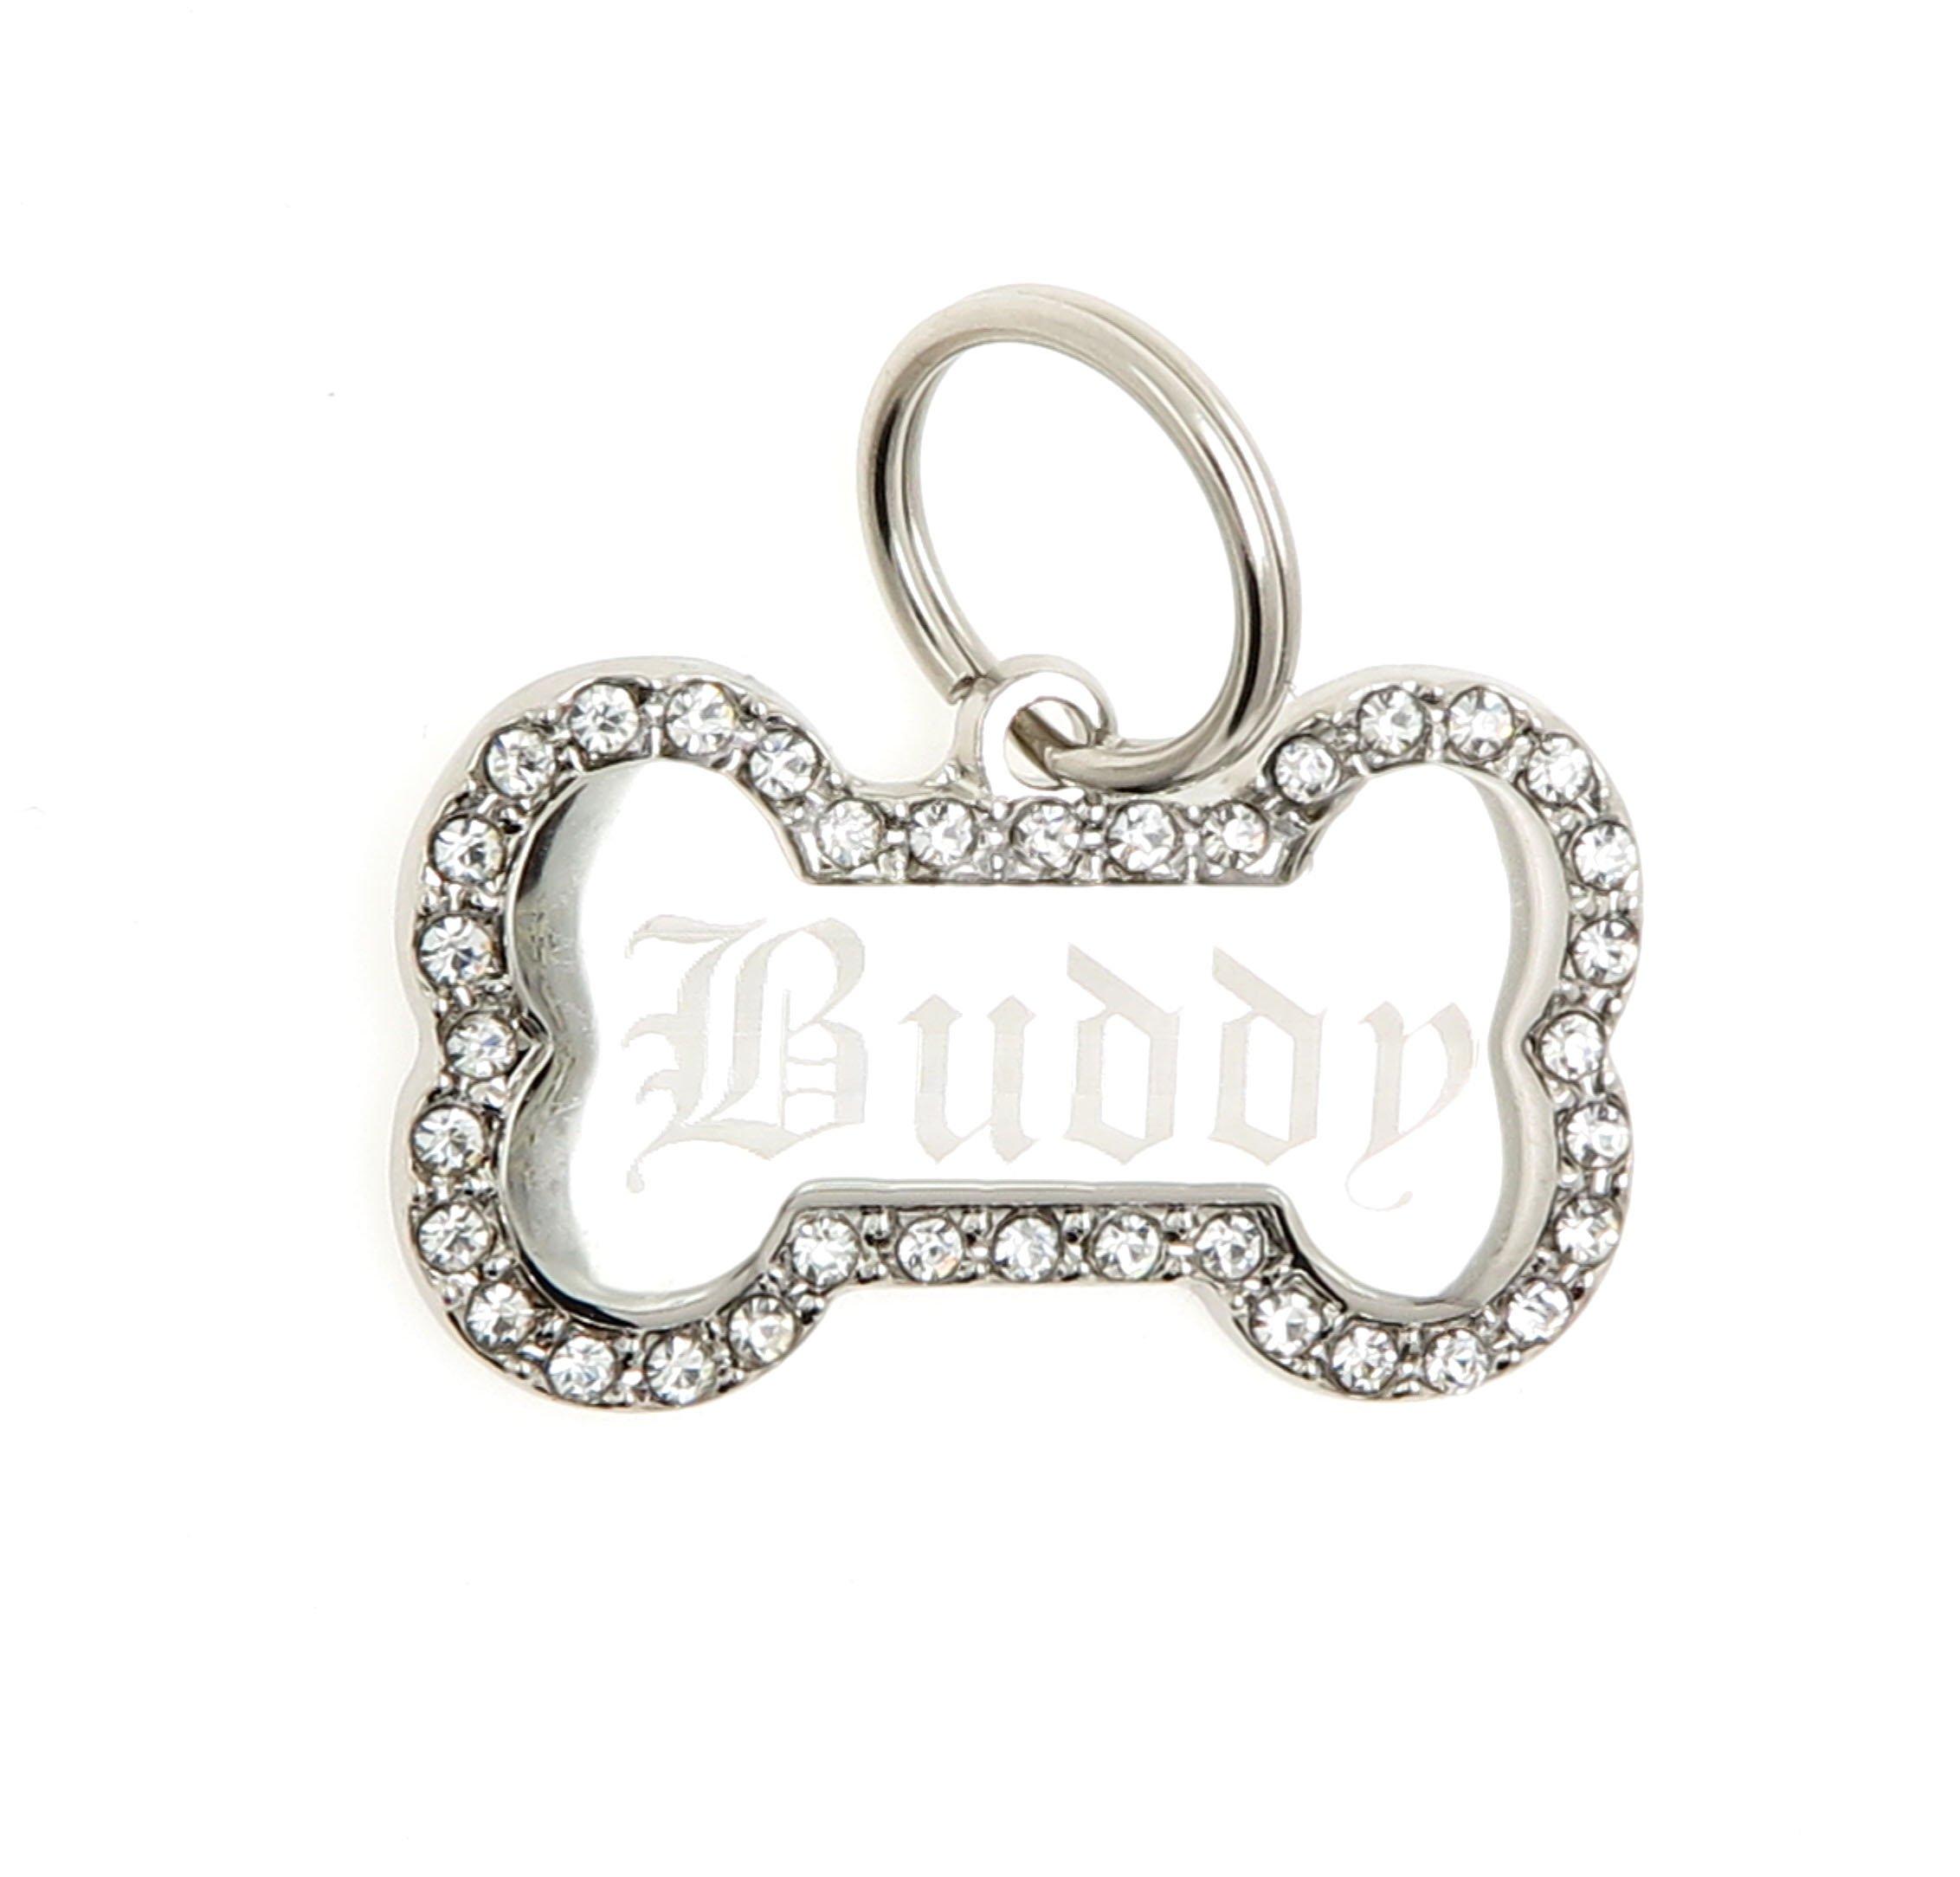 Custom Engraved Personalized Stainless Steel Bone Shape Swaroski Zirconia Dog Pet ID Jewelry Bling Tag